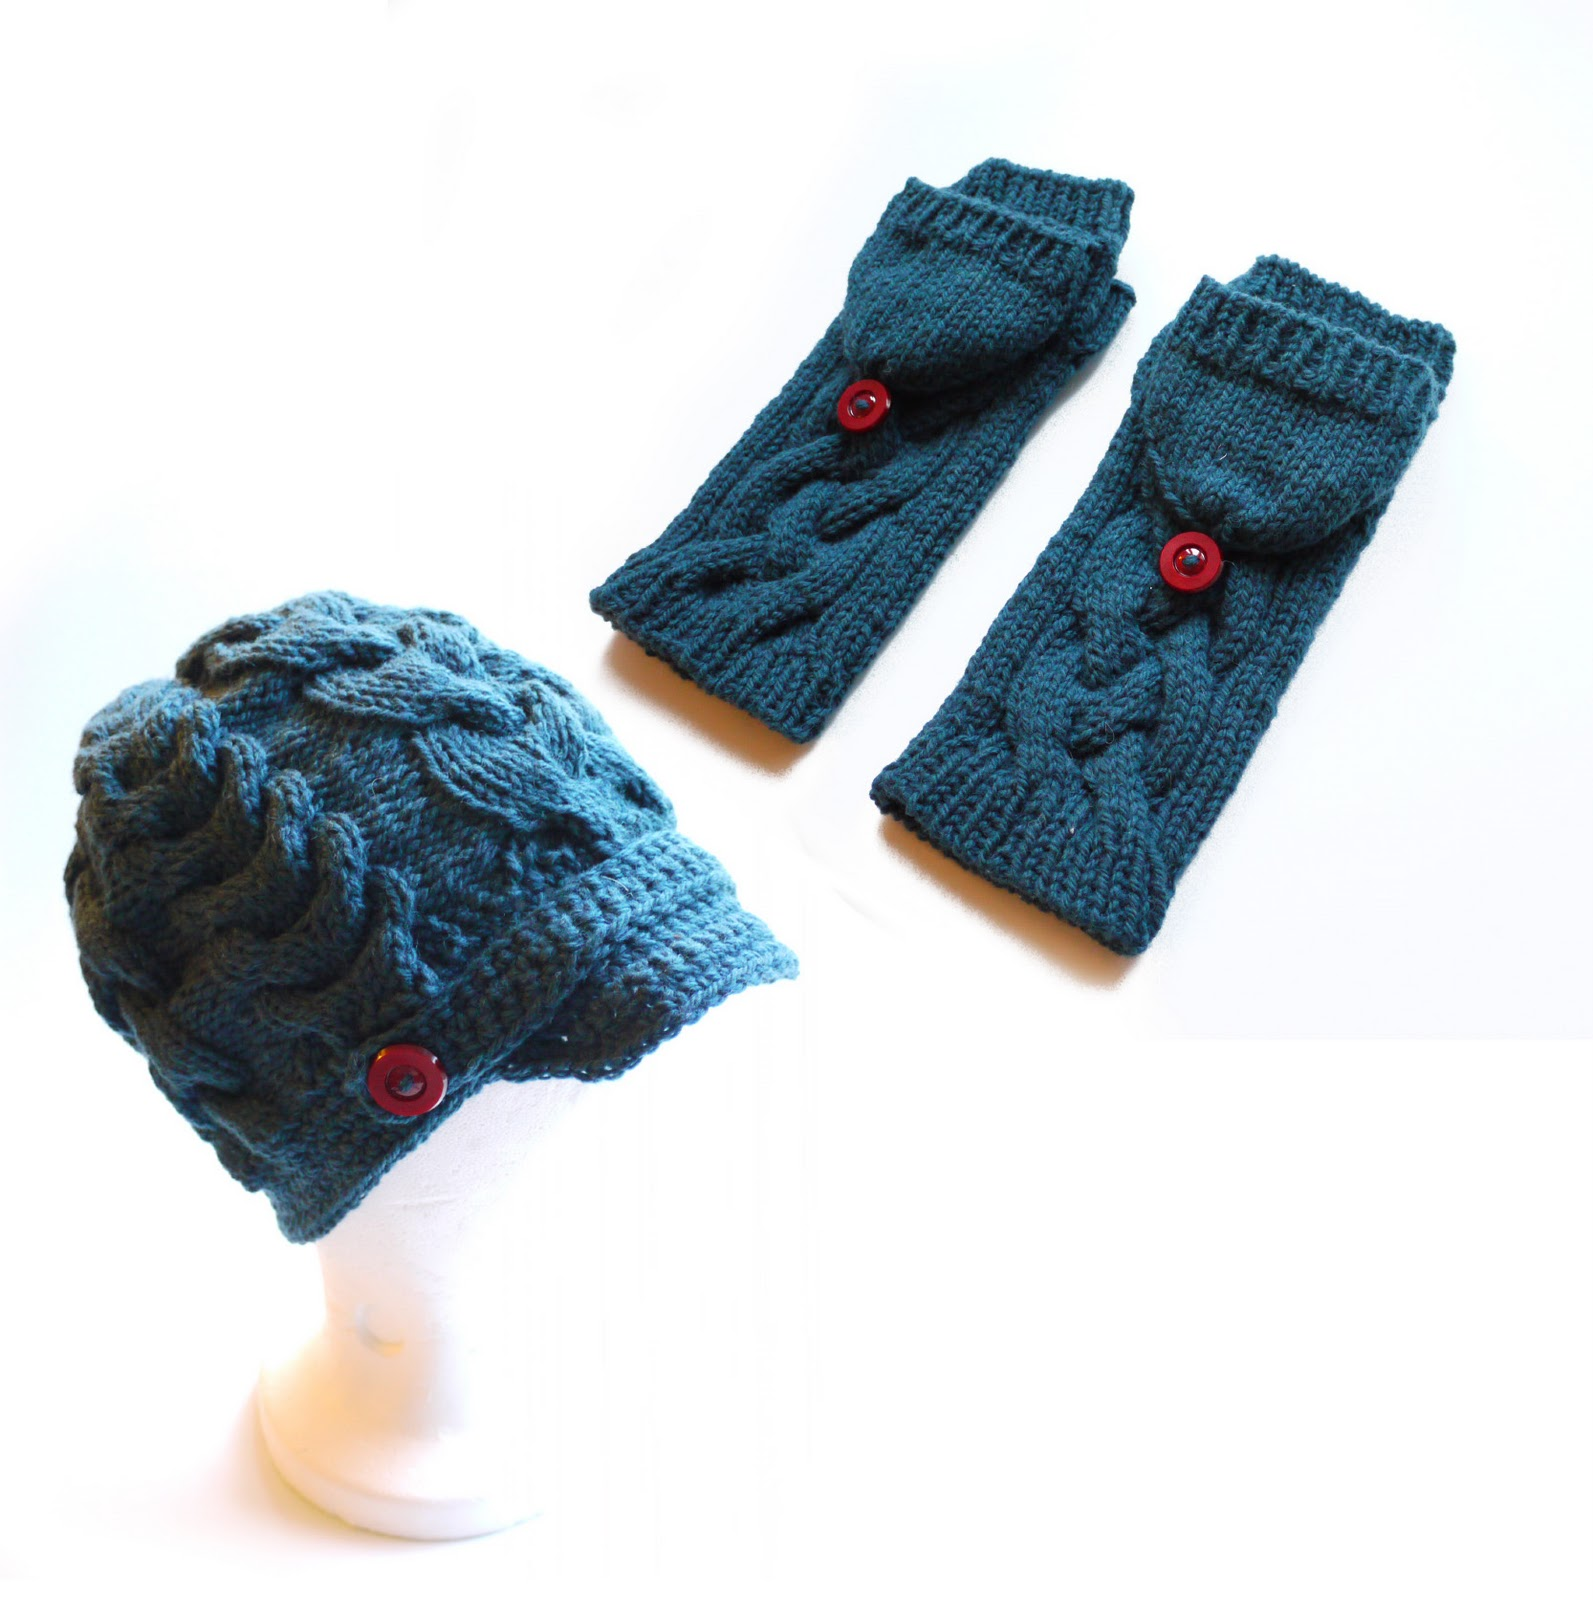 Convertible Mitten Knitting Pattern : CONVERTIBLE MITTENS CROCHET PATTERN Crochet Patterns